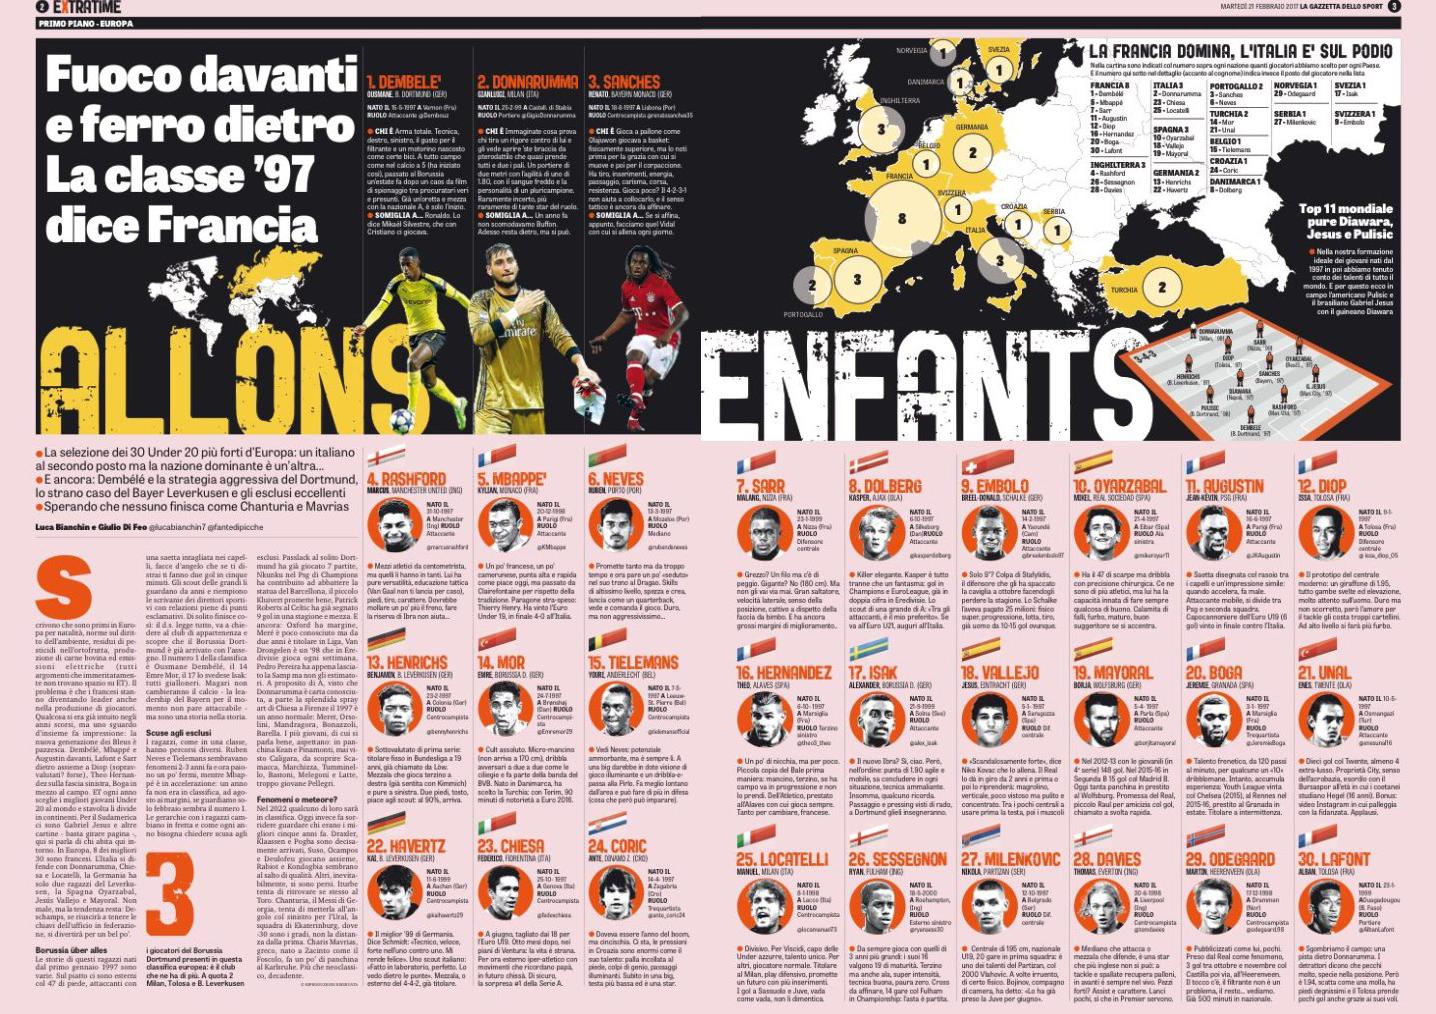 best u20 players in europe